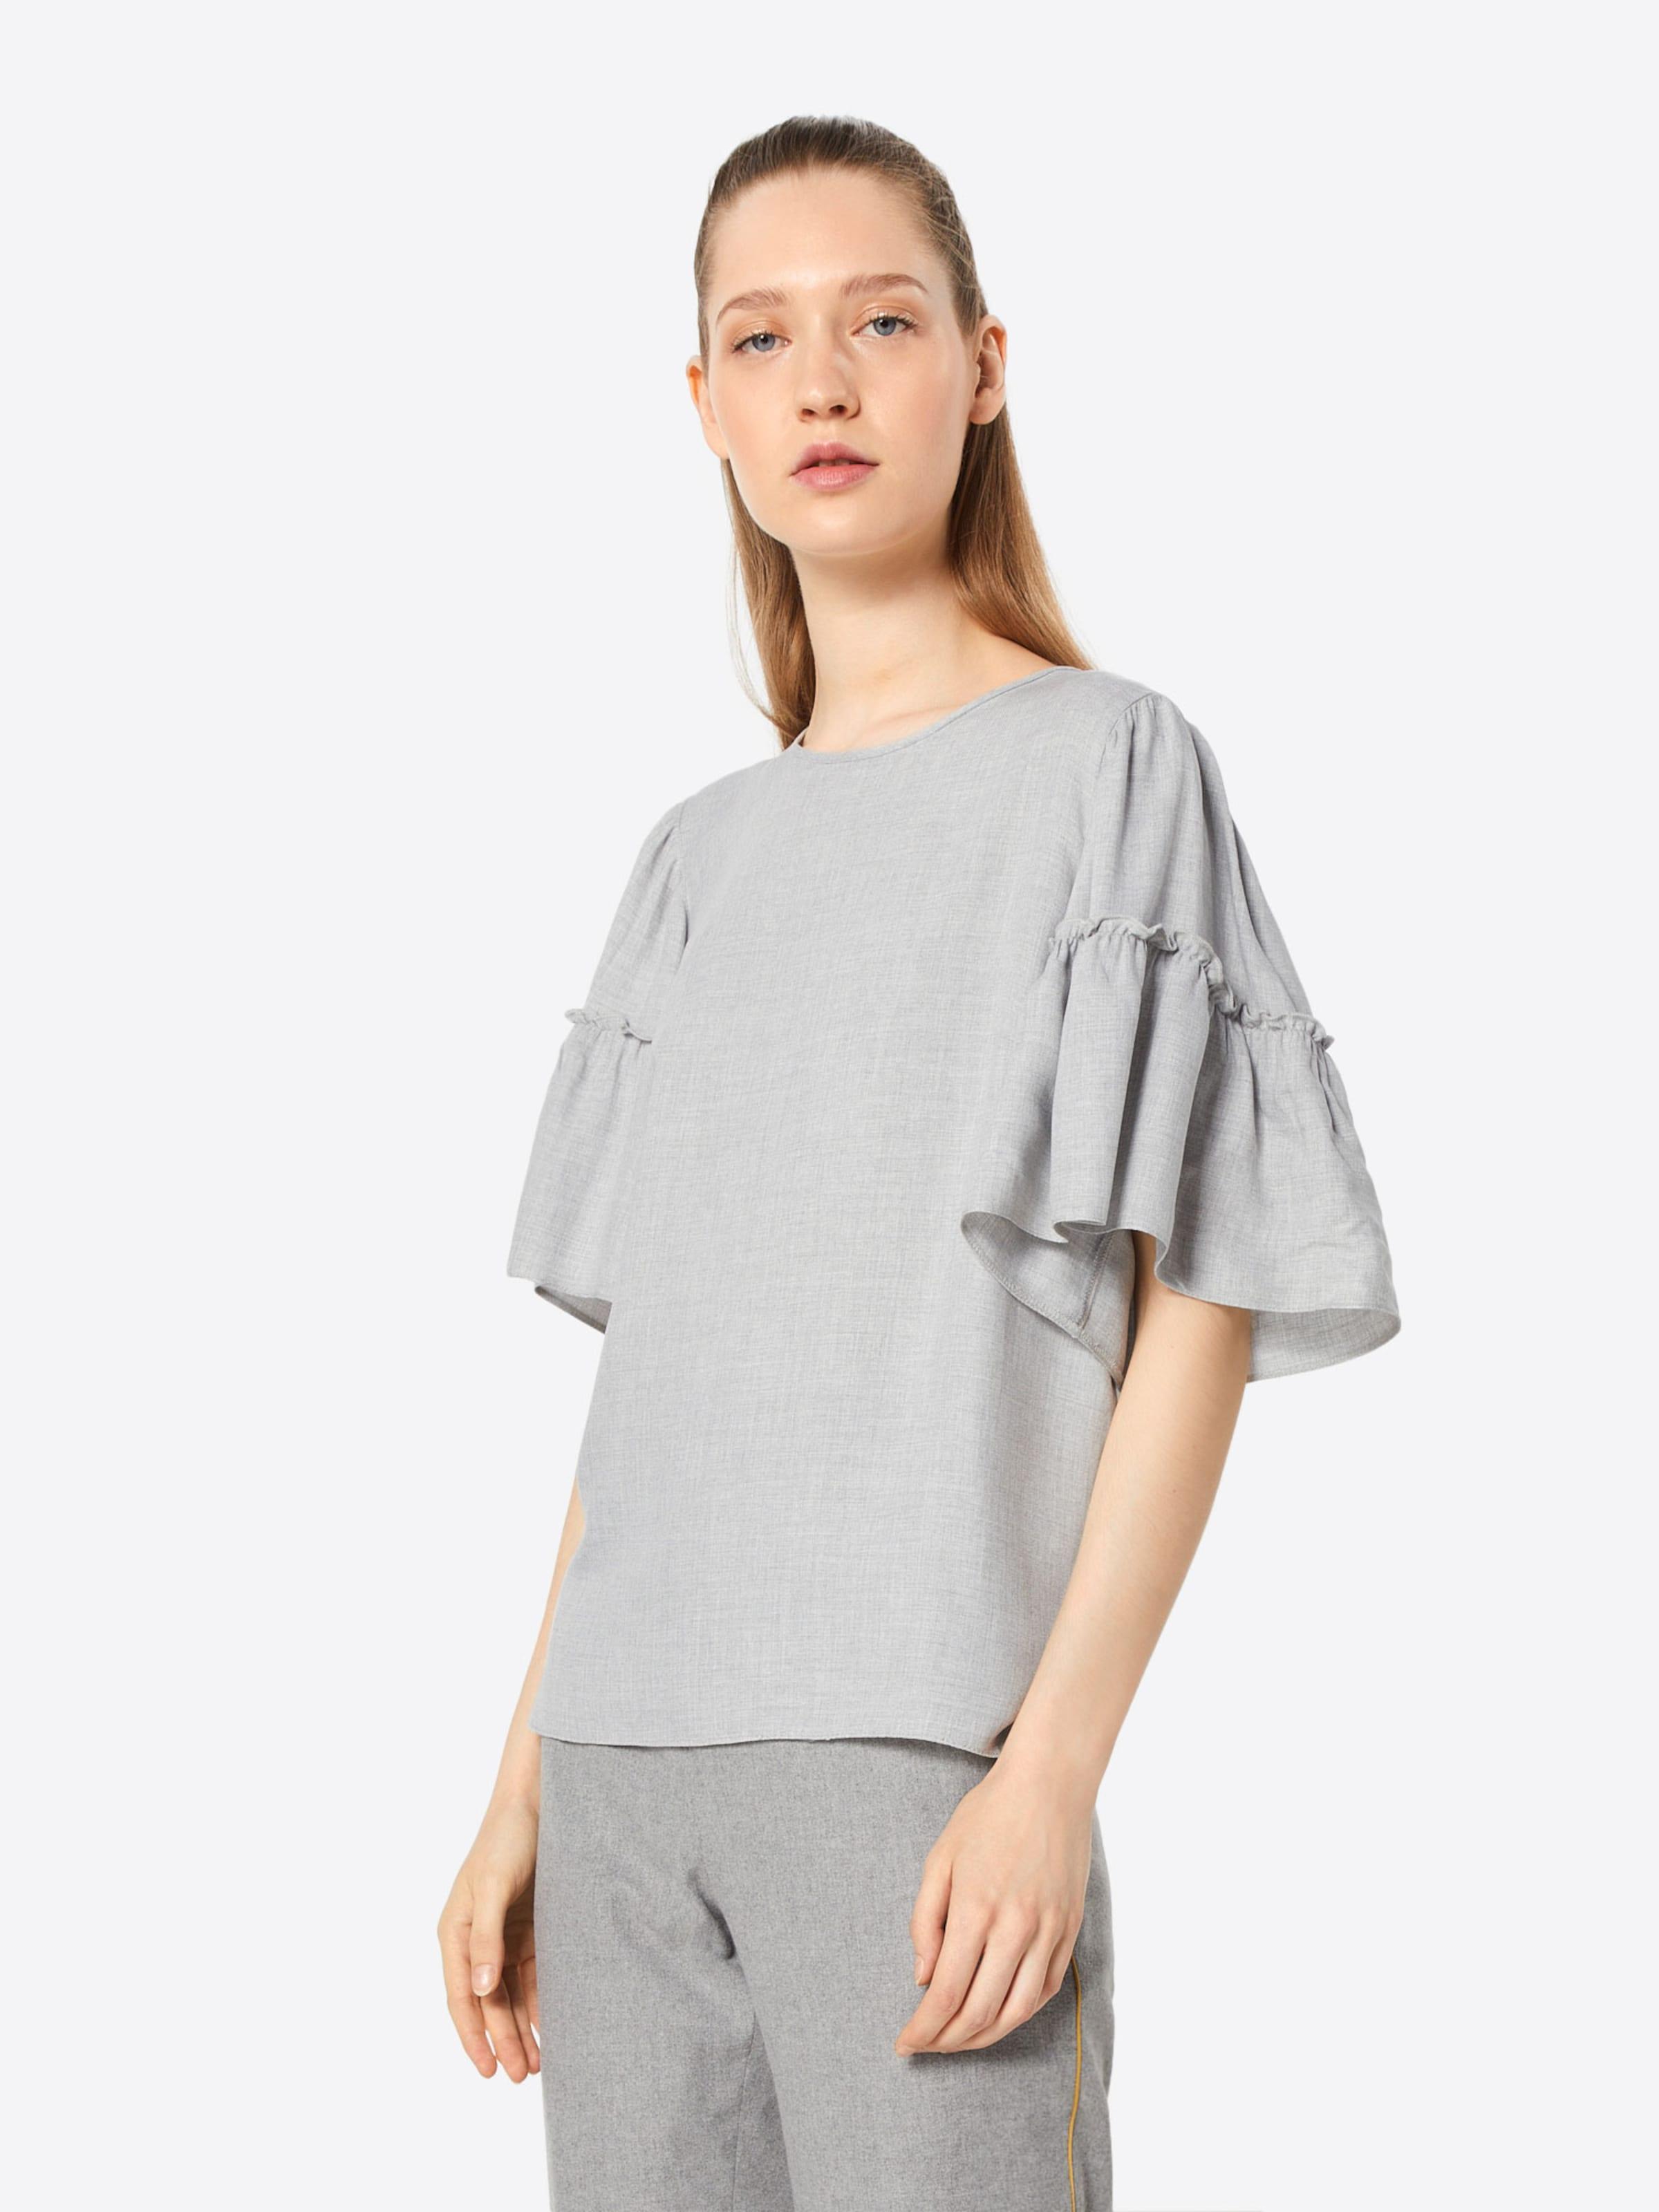 Look Hellgrau New Shirt New In dCorexB